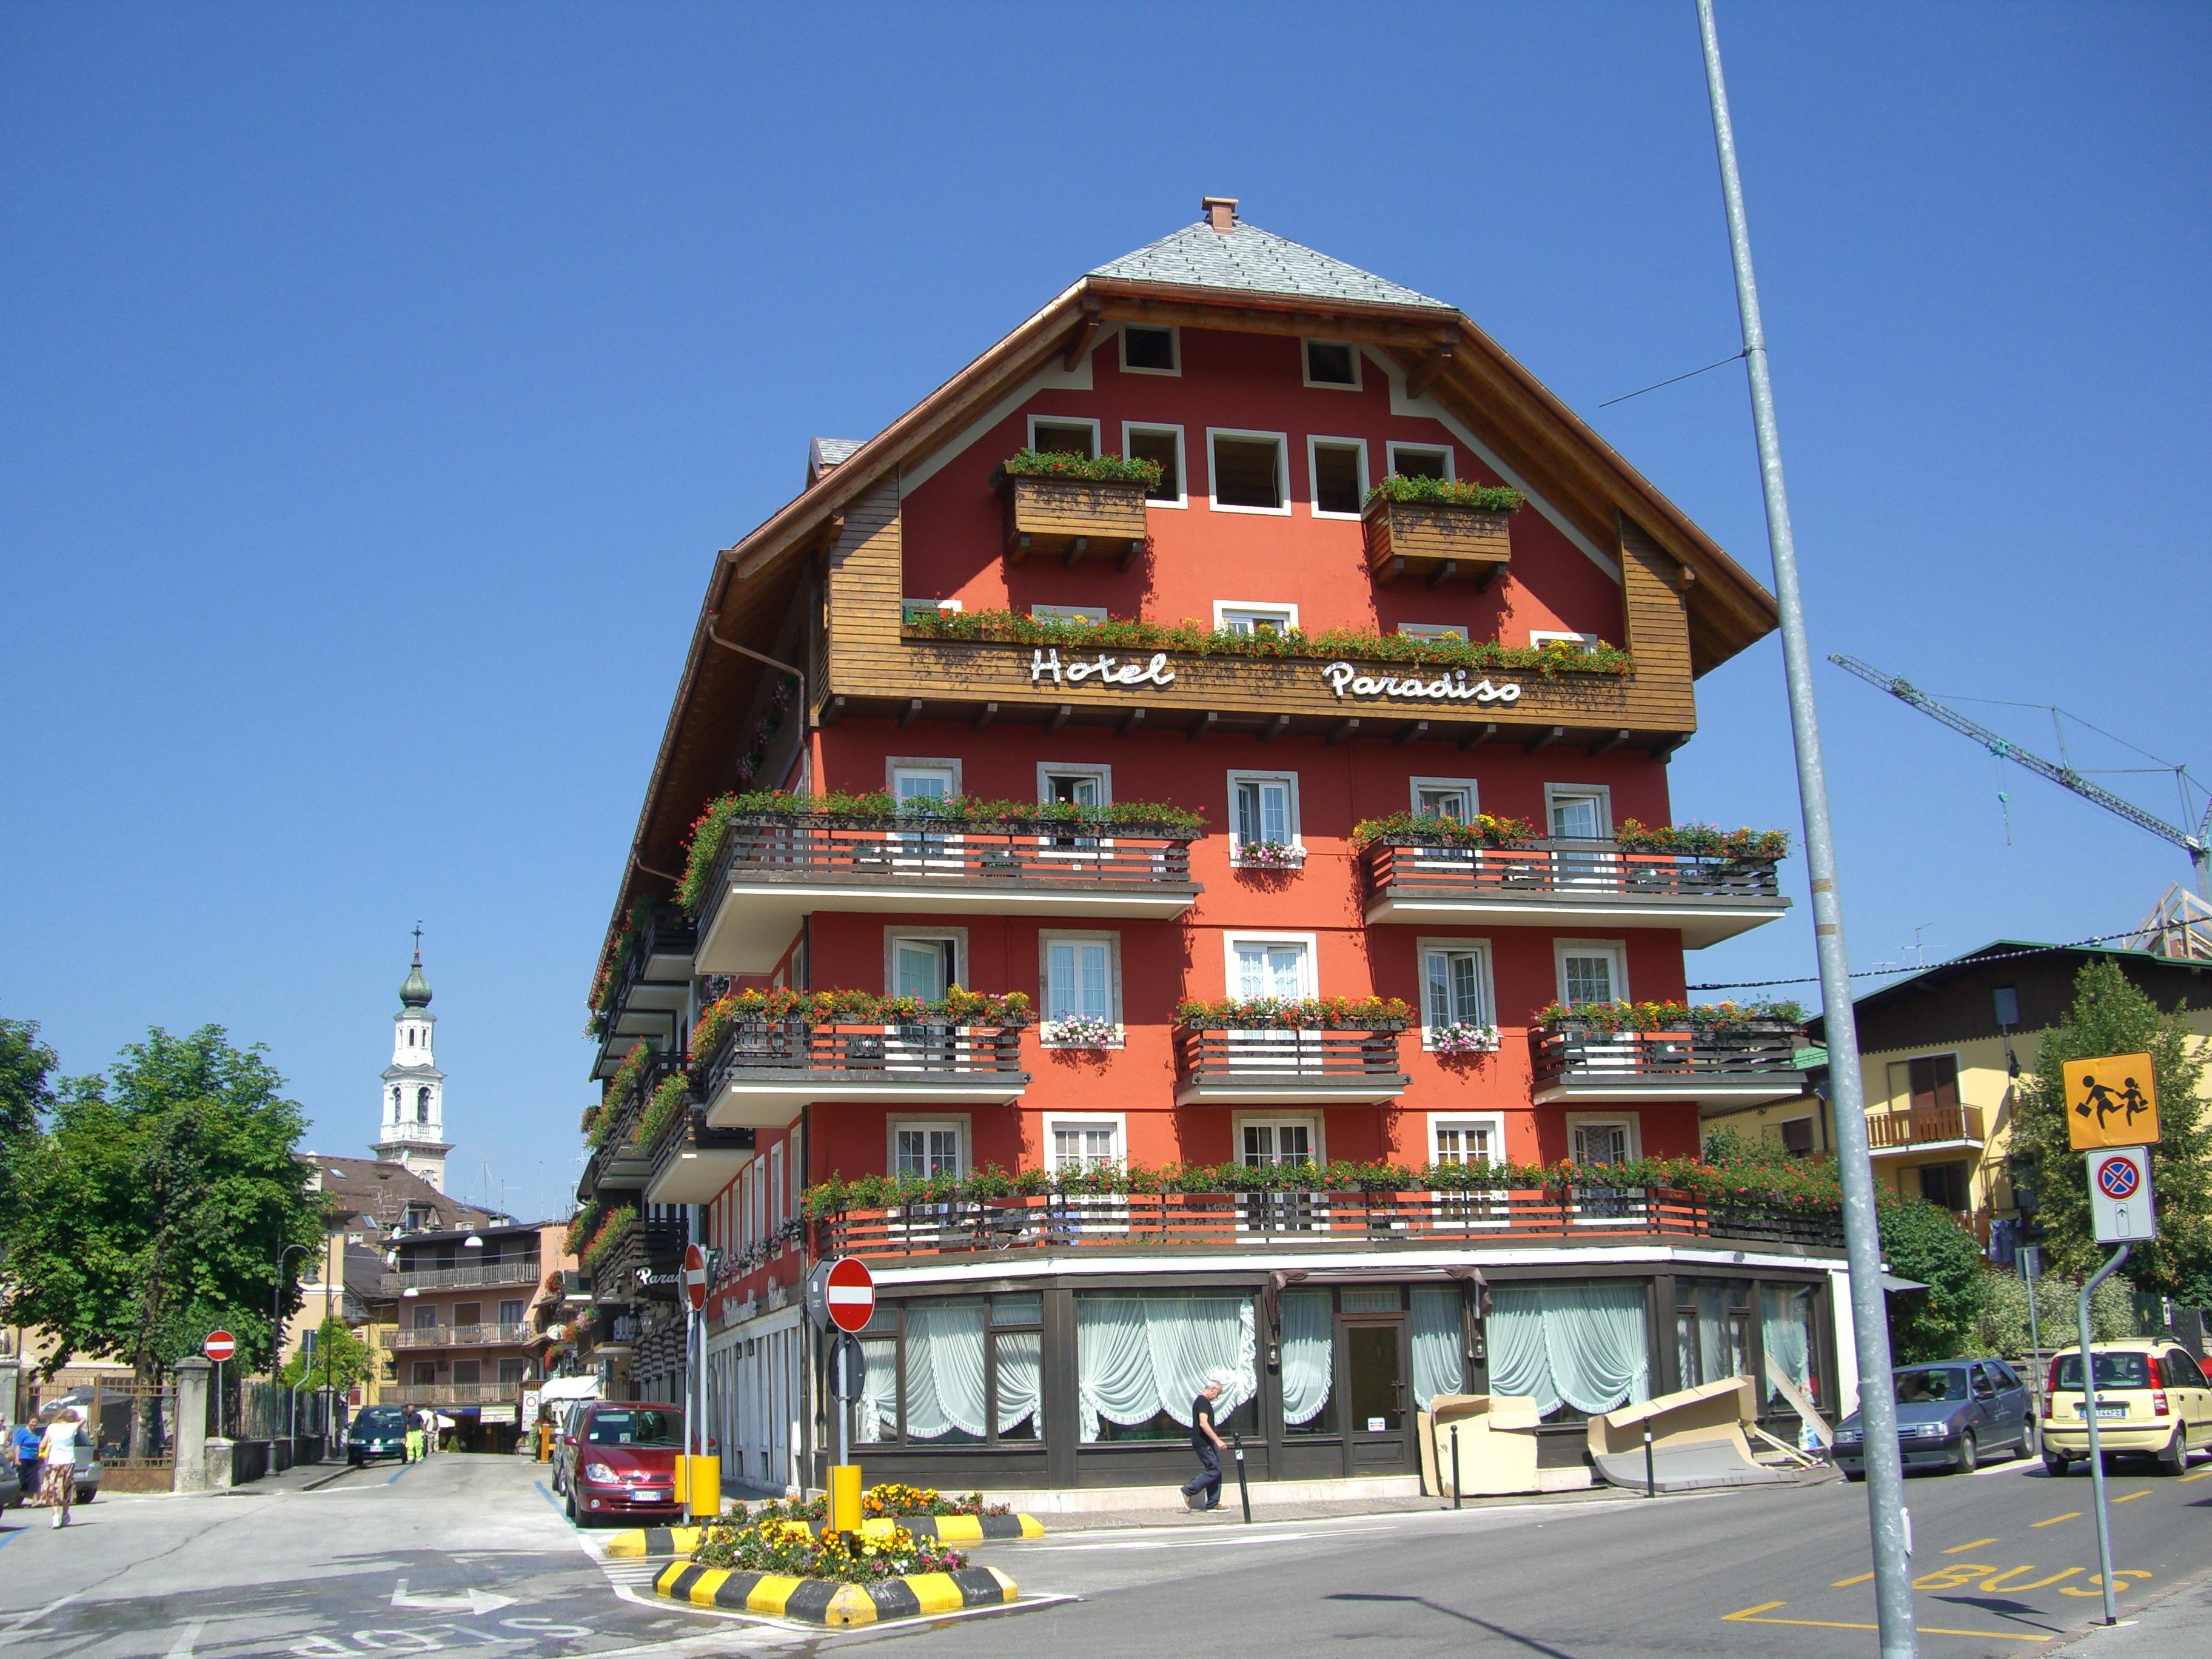 Settimana bianca hotel paradiso asiago for Albergo paradiso asiago